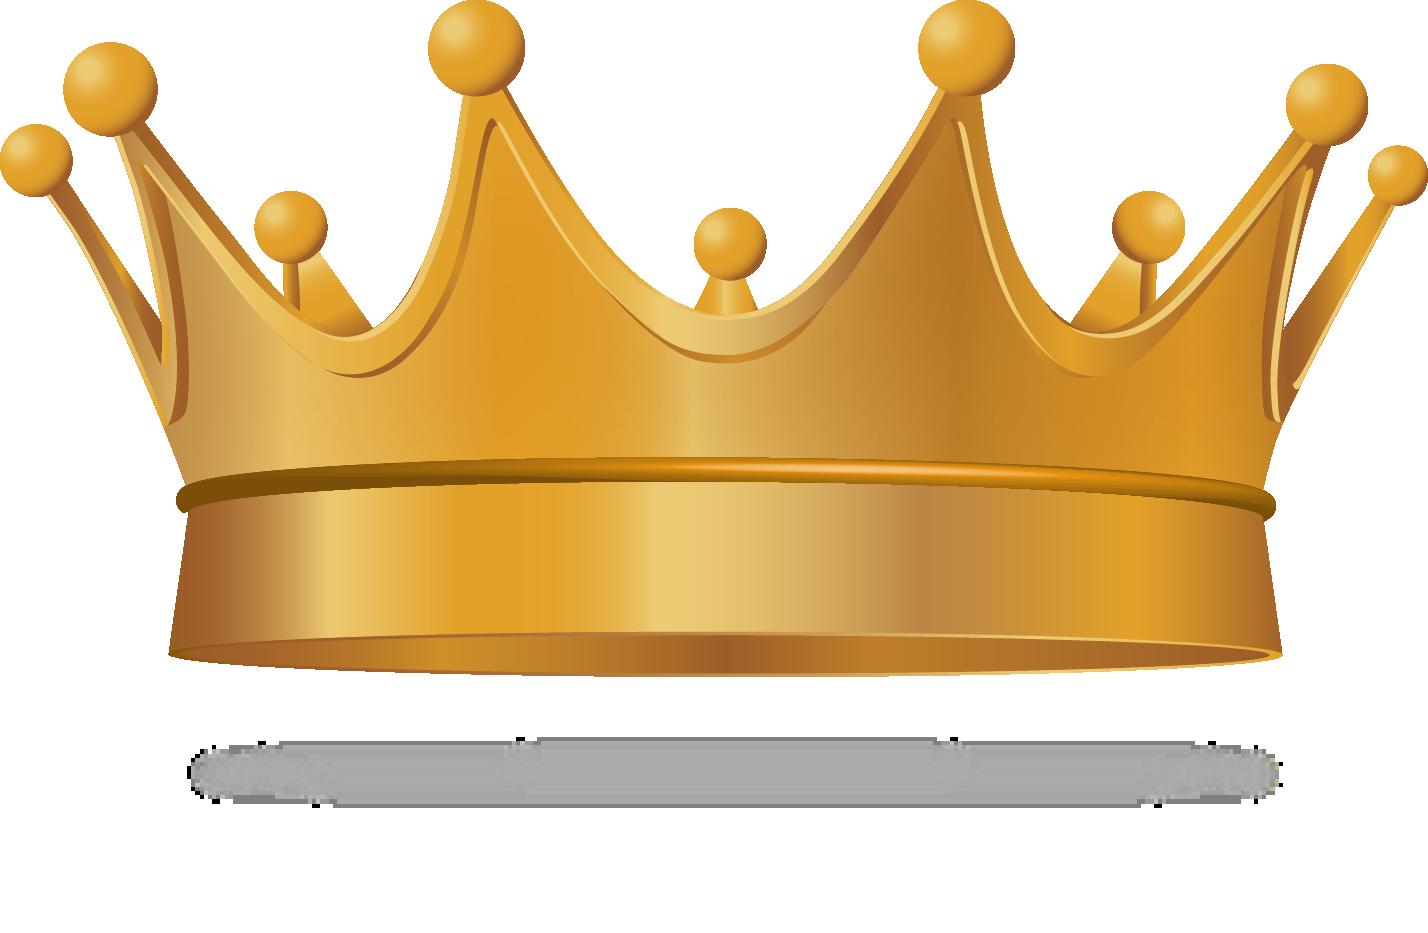 King crown clipart vector clipart royalty free stock Crown Euclidean vector King - Vector exquisite crown 1428*933 ... clipart royalty free stock